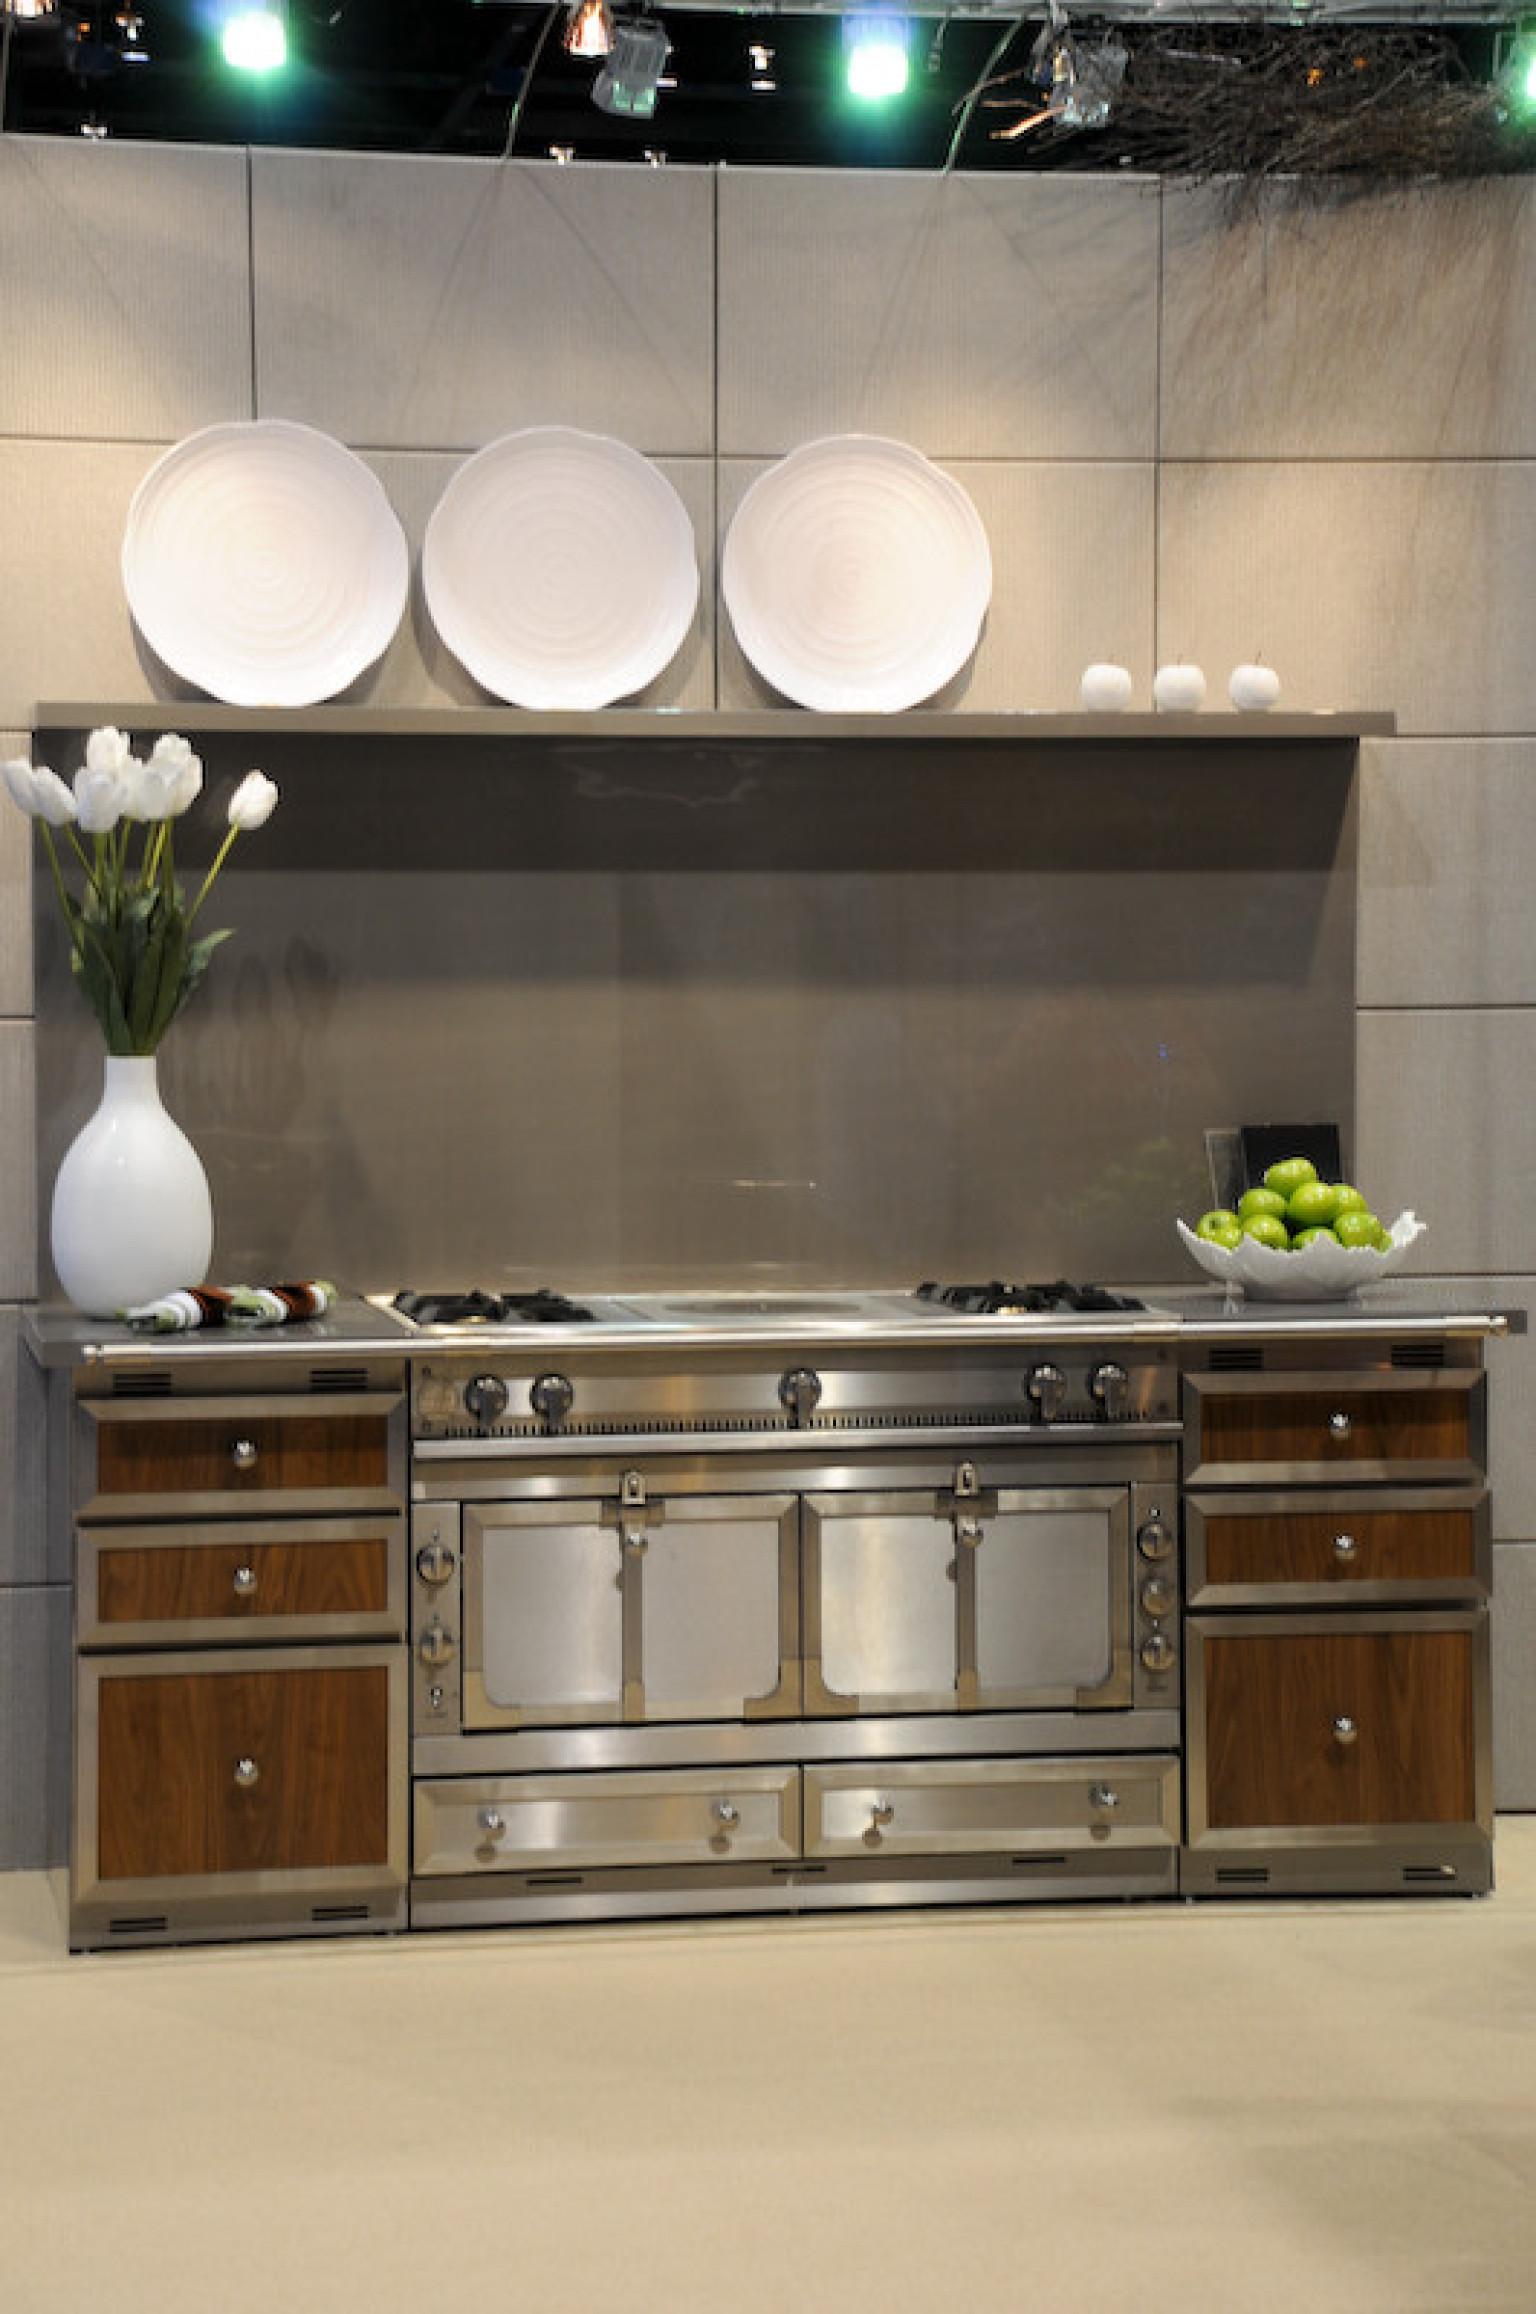 10 DIY Appliance Maintenance Tips To Keep Them Running ...